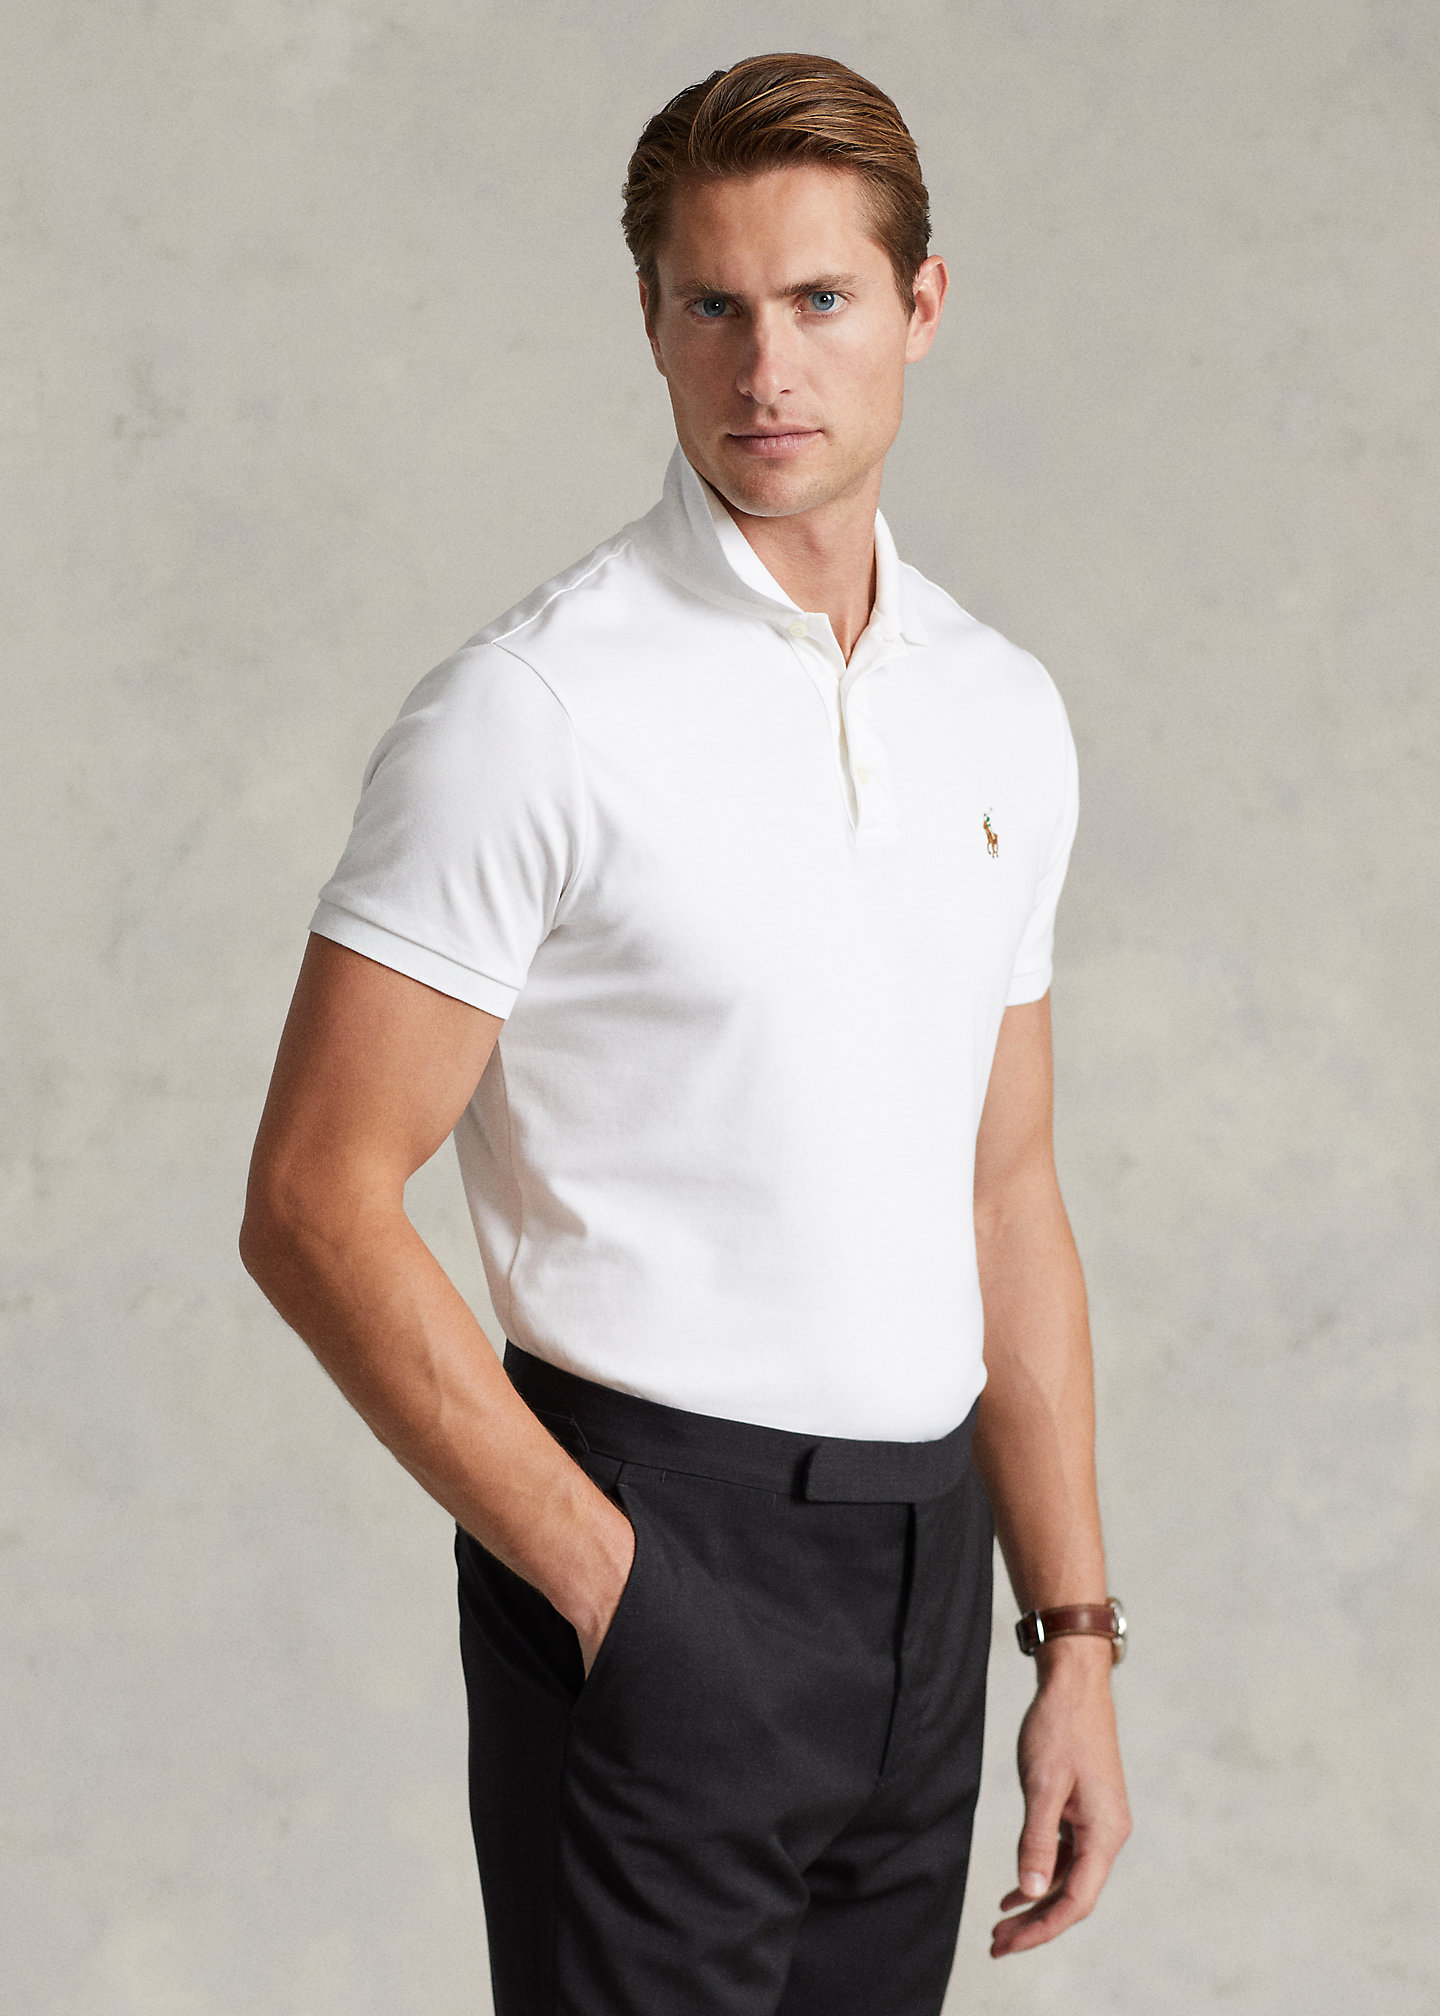 Polo Ralph Lauren Soft Cotton Polo Shirt - All Fits 1